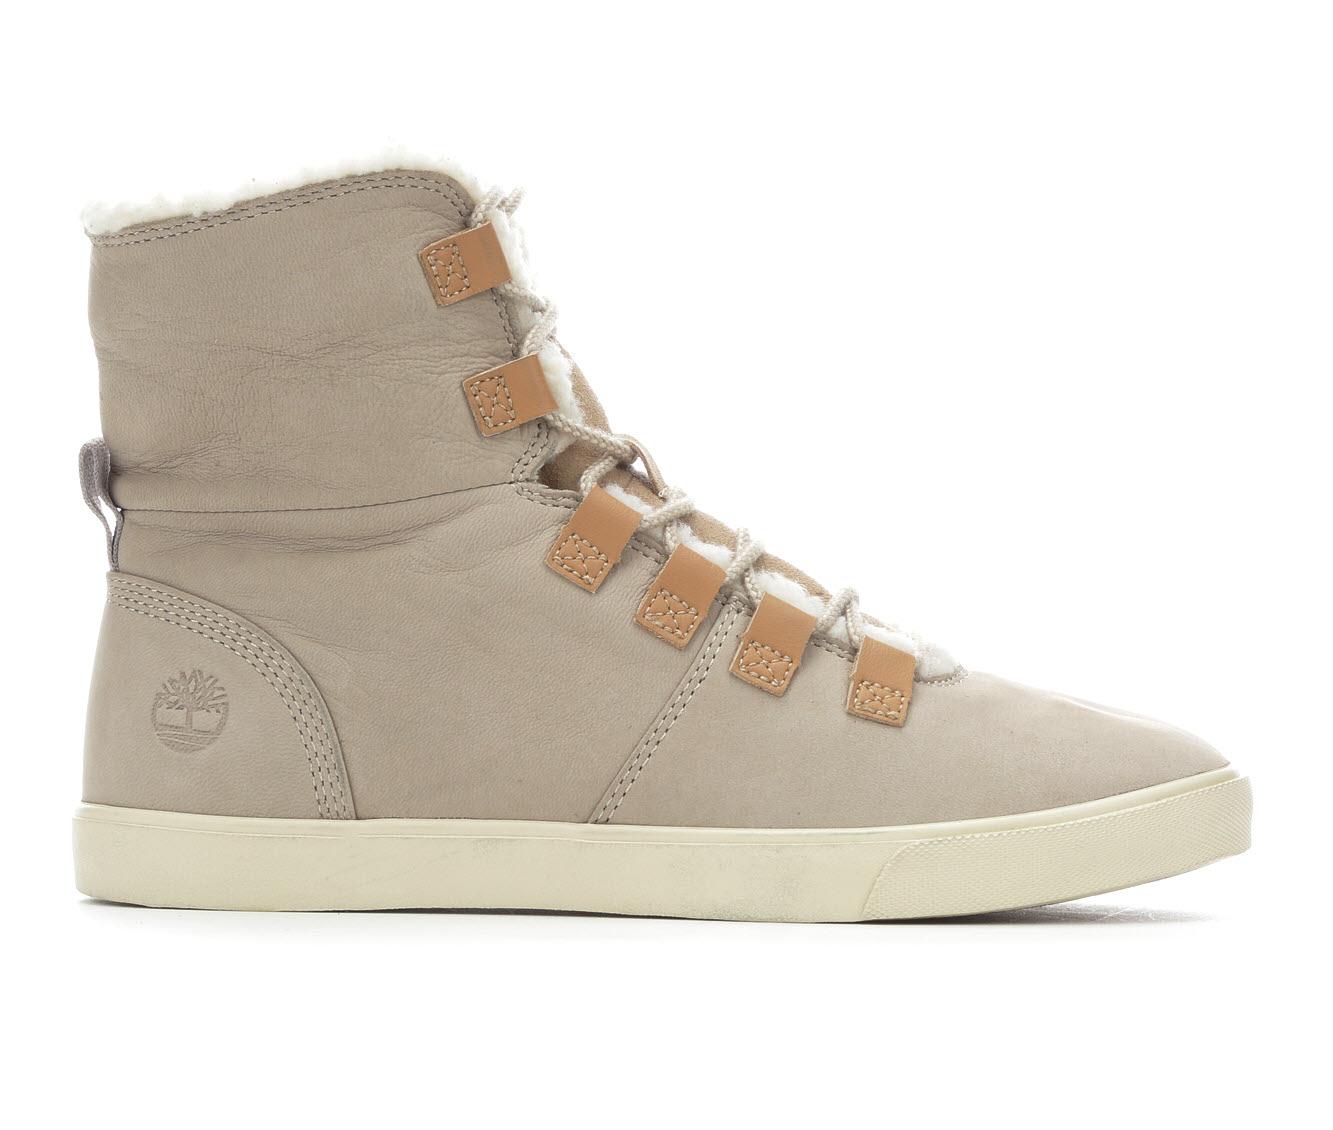 Timberland Dausette Fleece Women's Boot (Beige Leather)